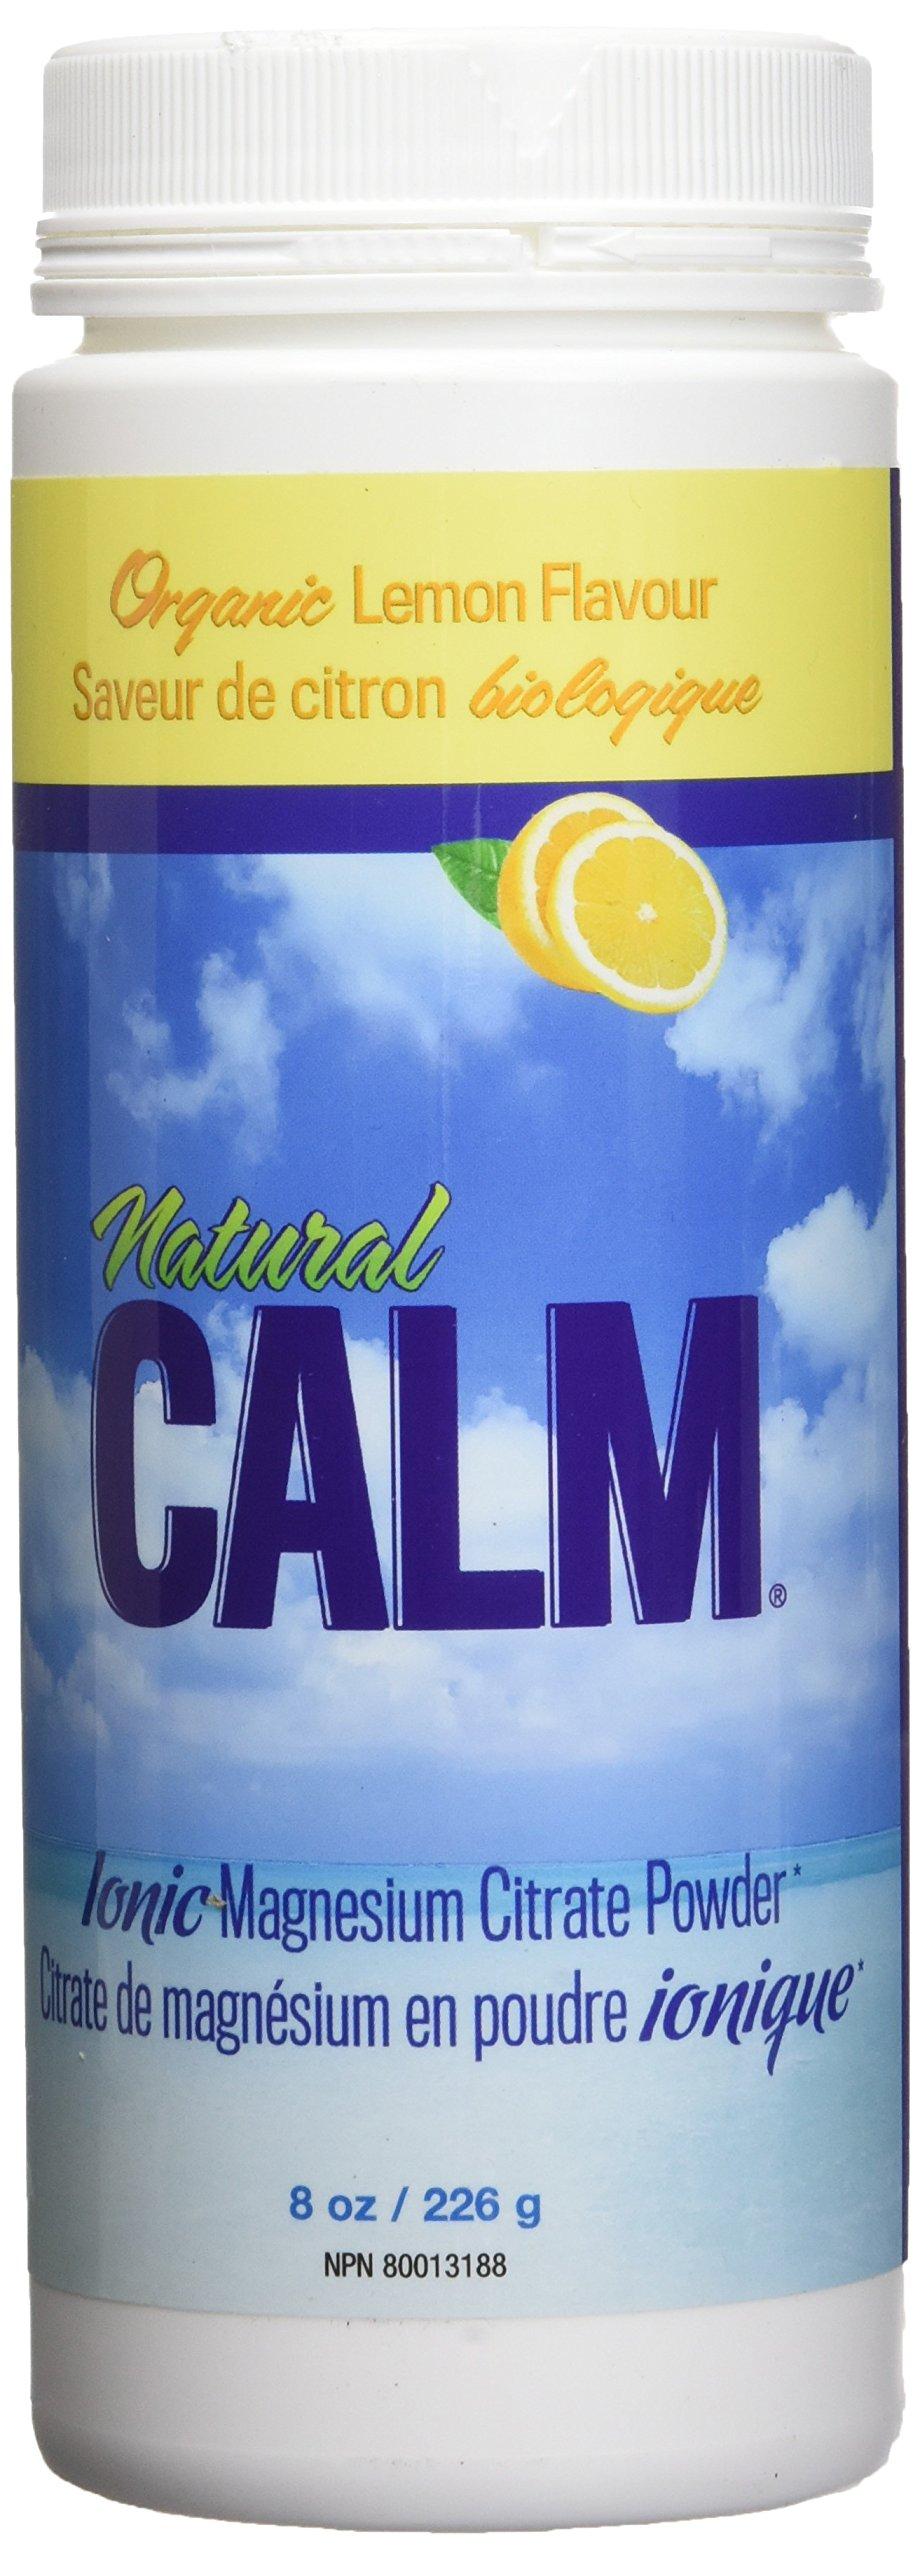 Natural Vitality Calm Supplement - 8 Oz. Sweet Lemon Drink, Anti-Stress Drink, Vegan Formula. Magnesium Drink